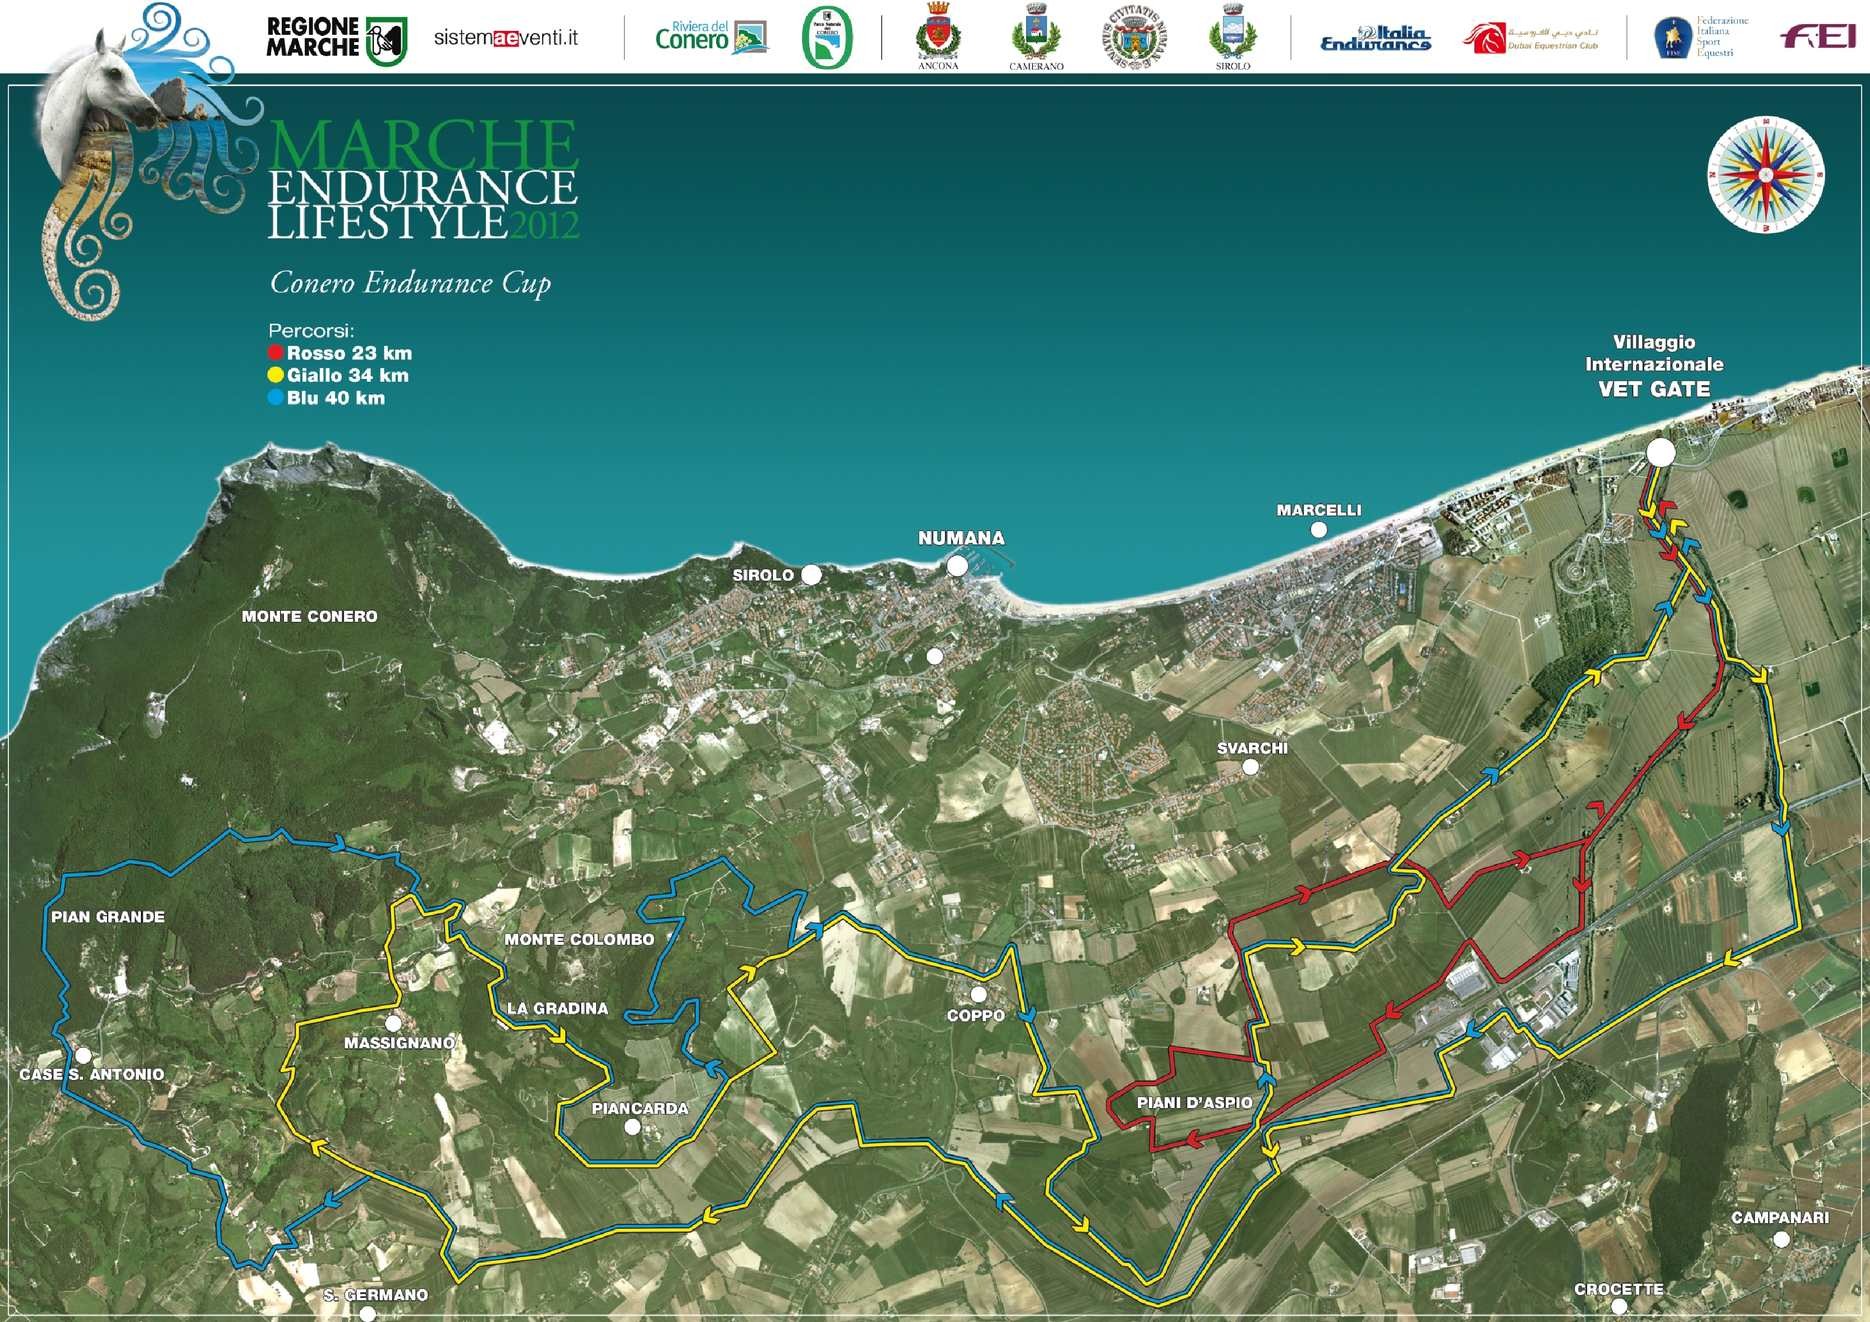 Cartina Conero Marche.Calameo Cartina Marche Endurance Lifestyle